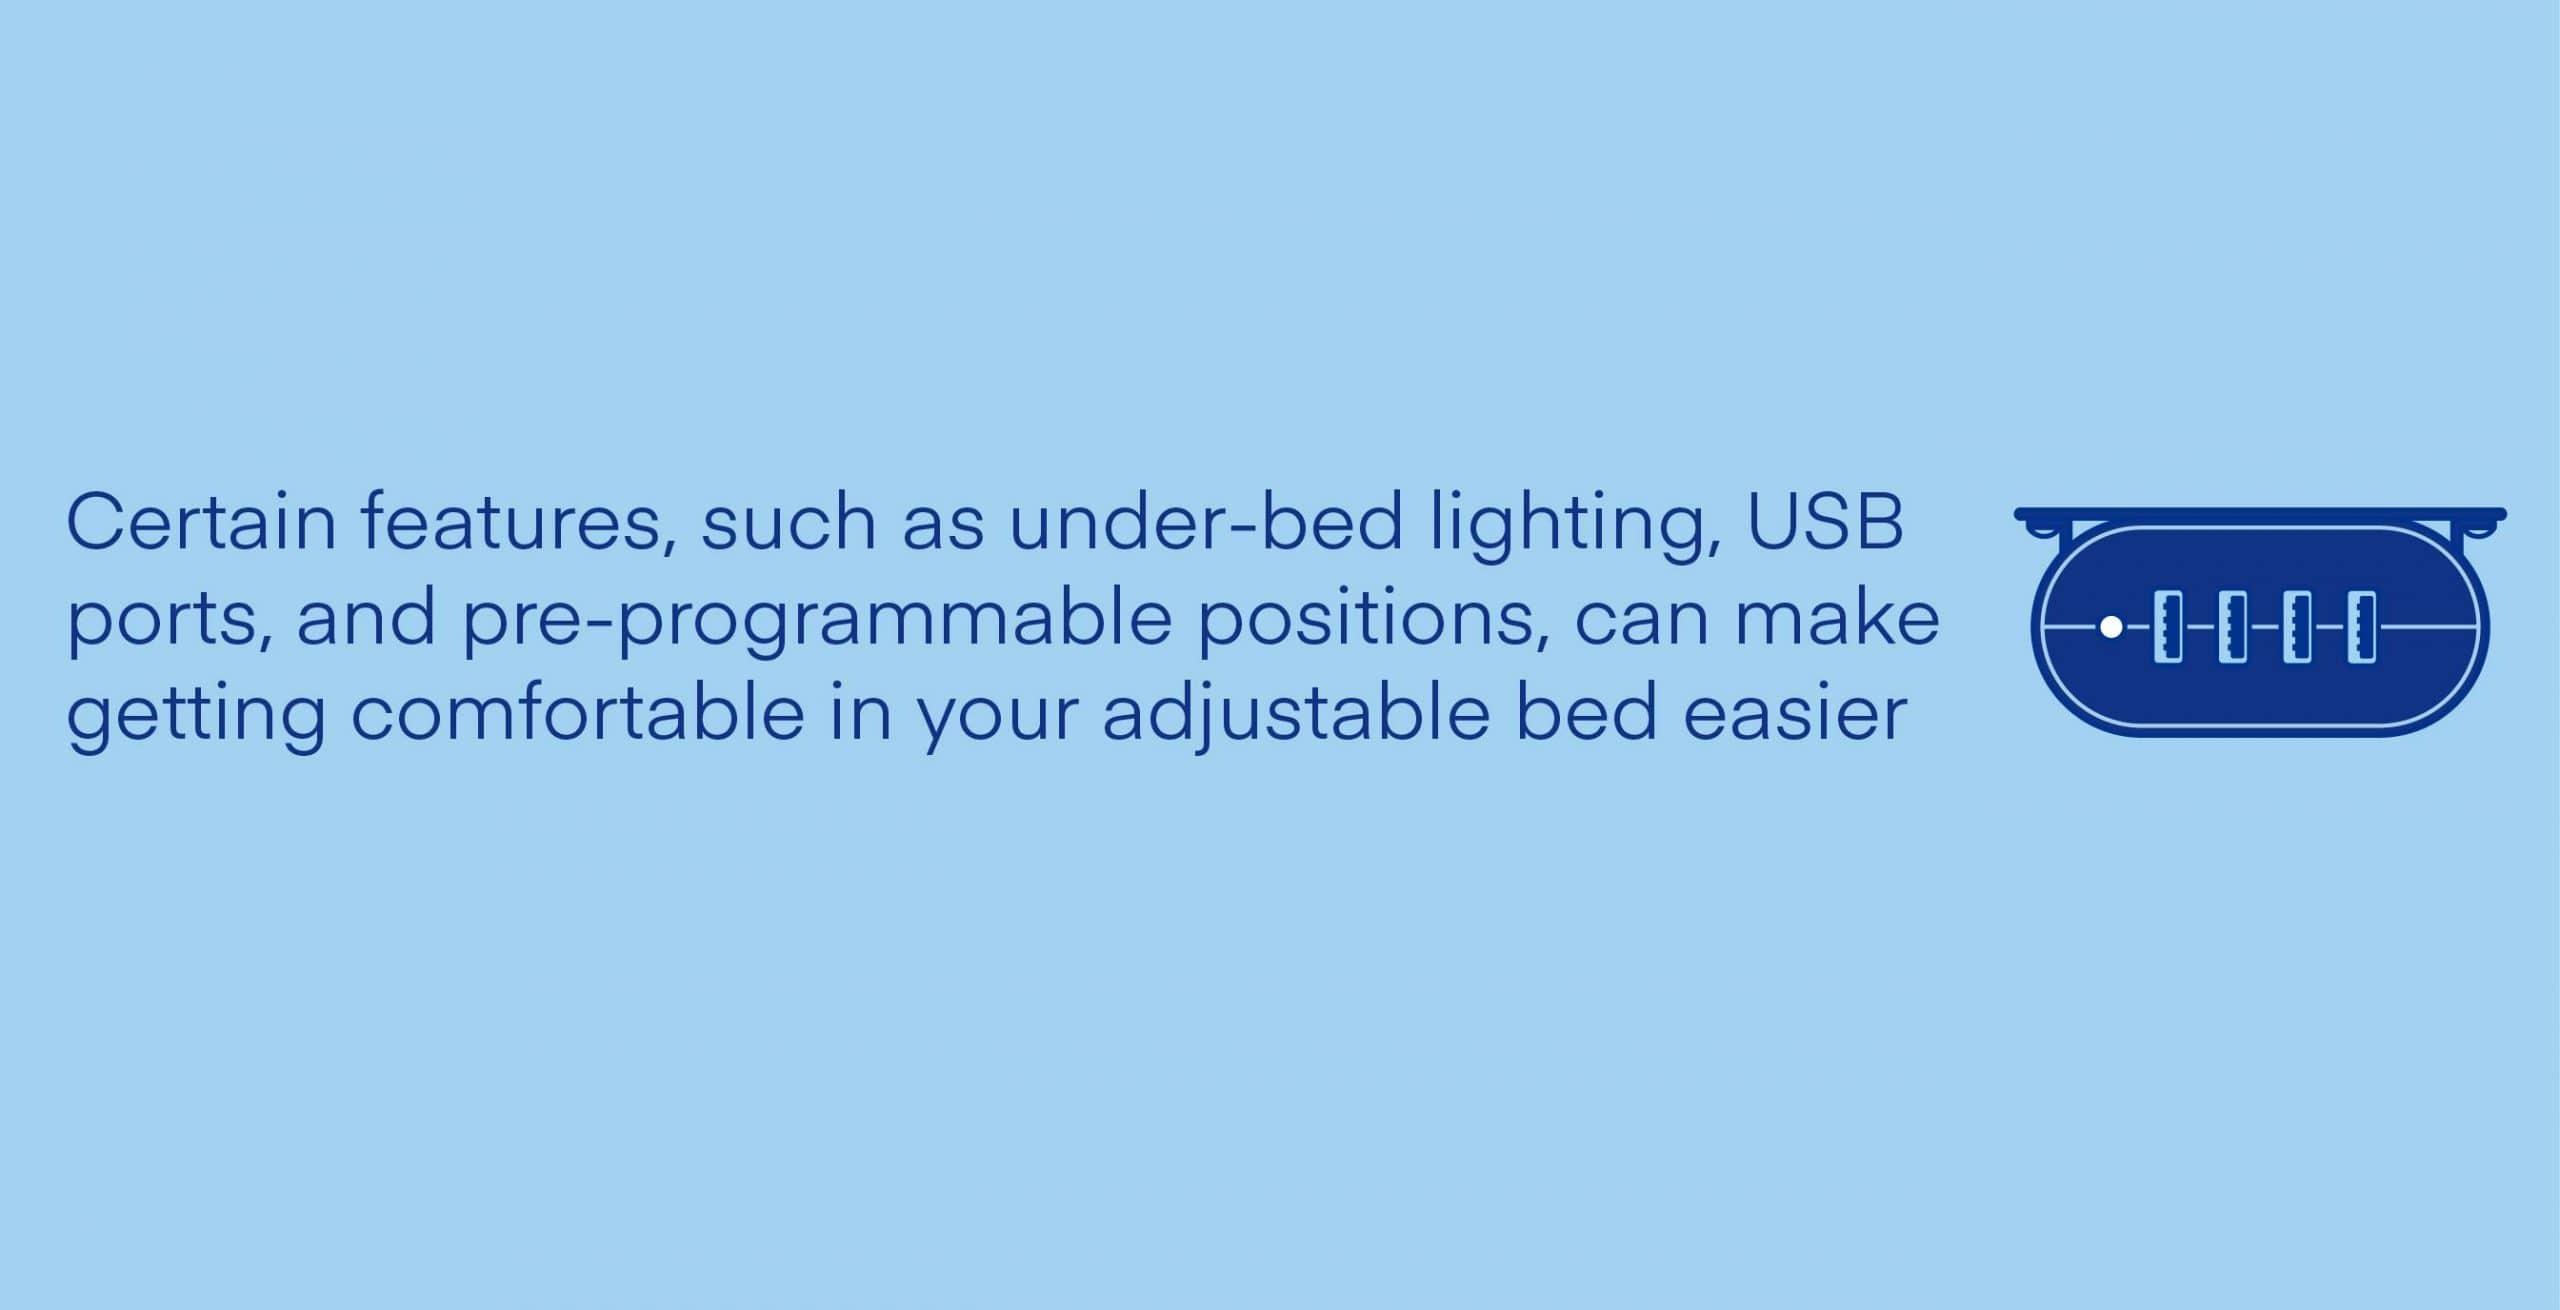 Wall Hugger Adjustable Bed